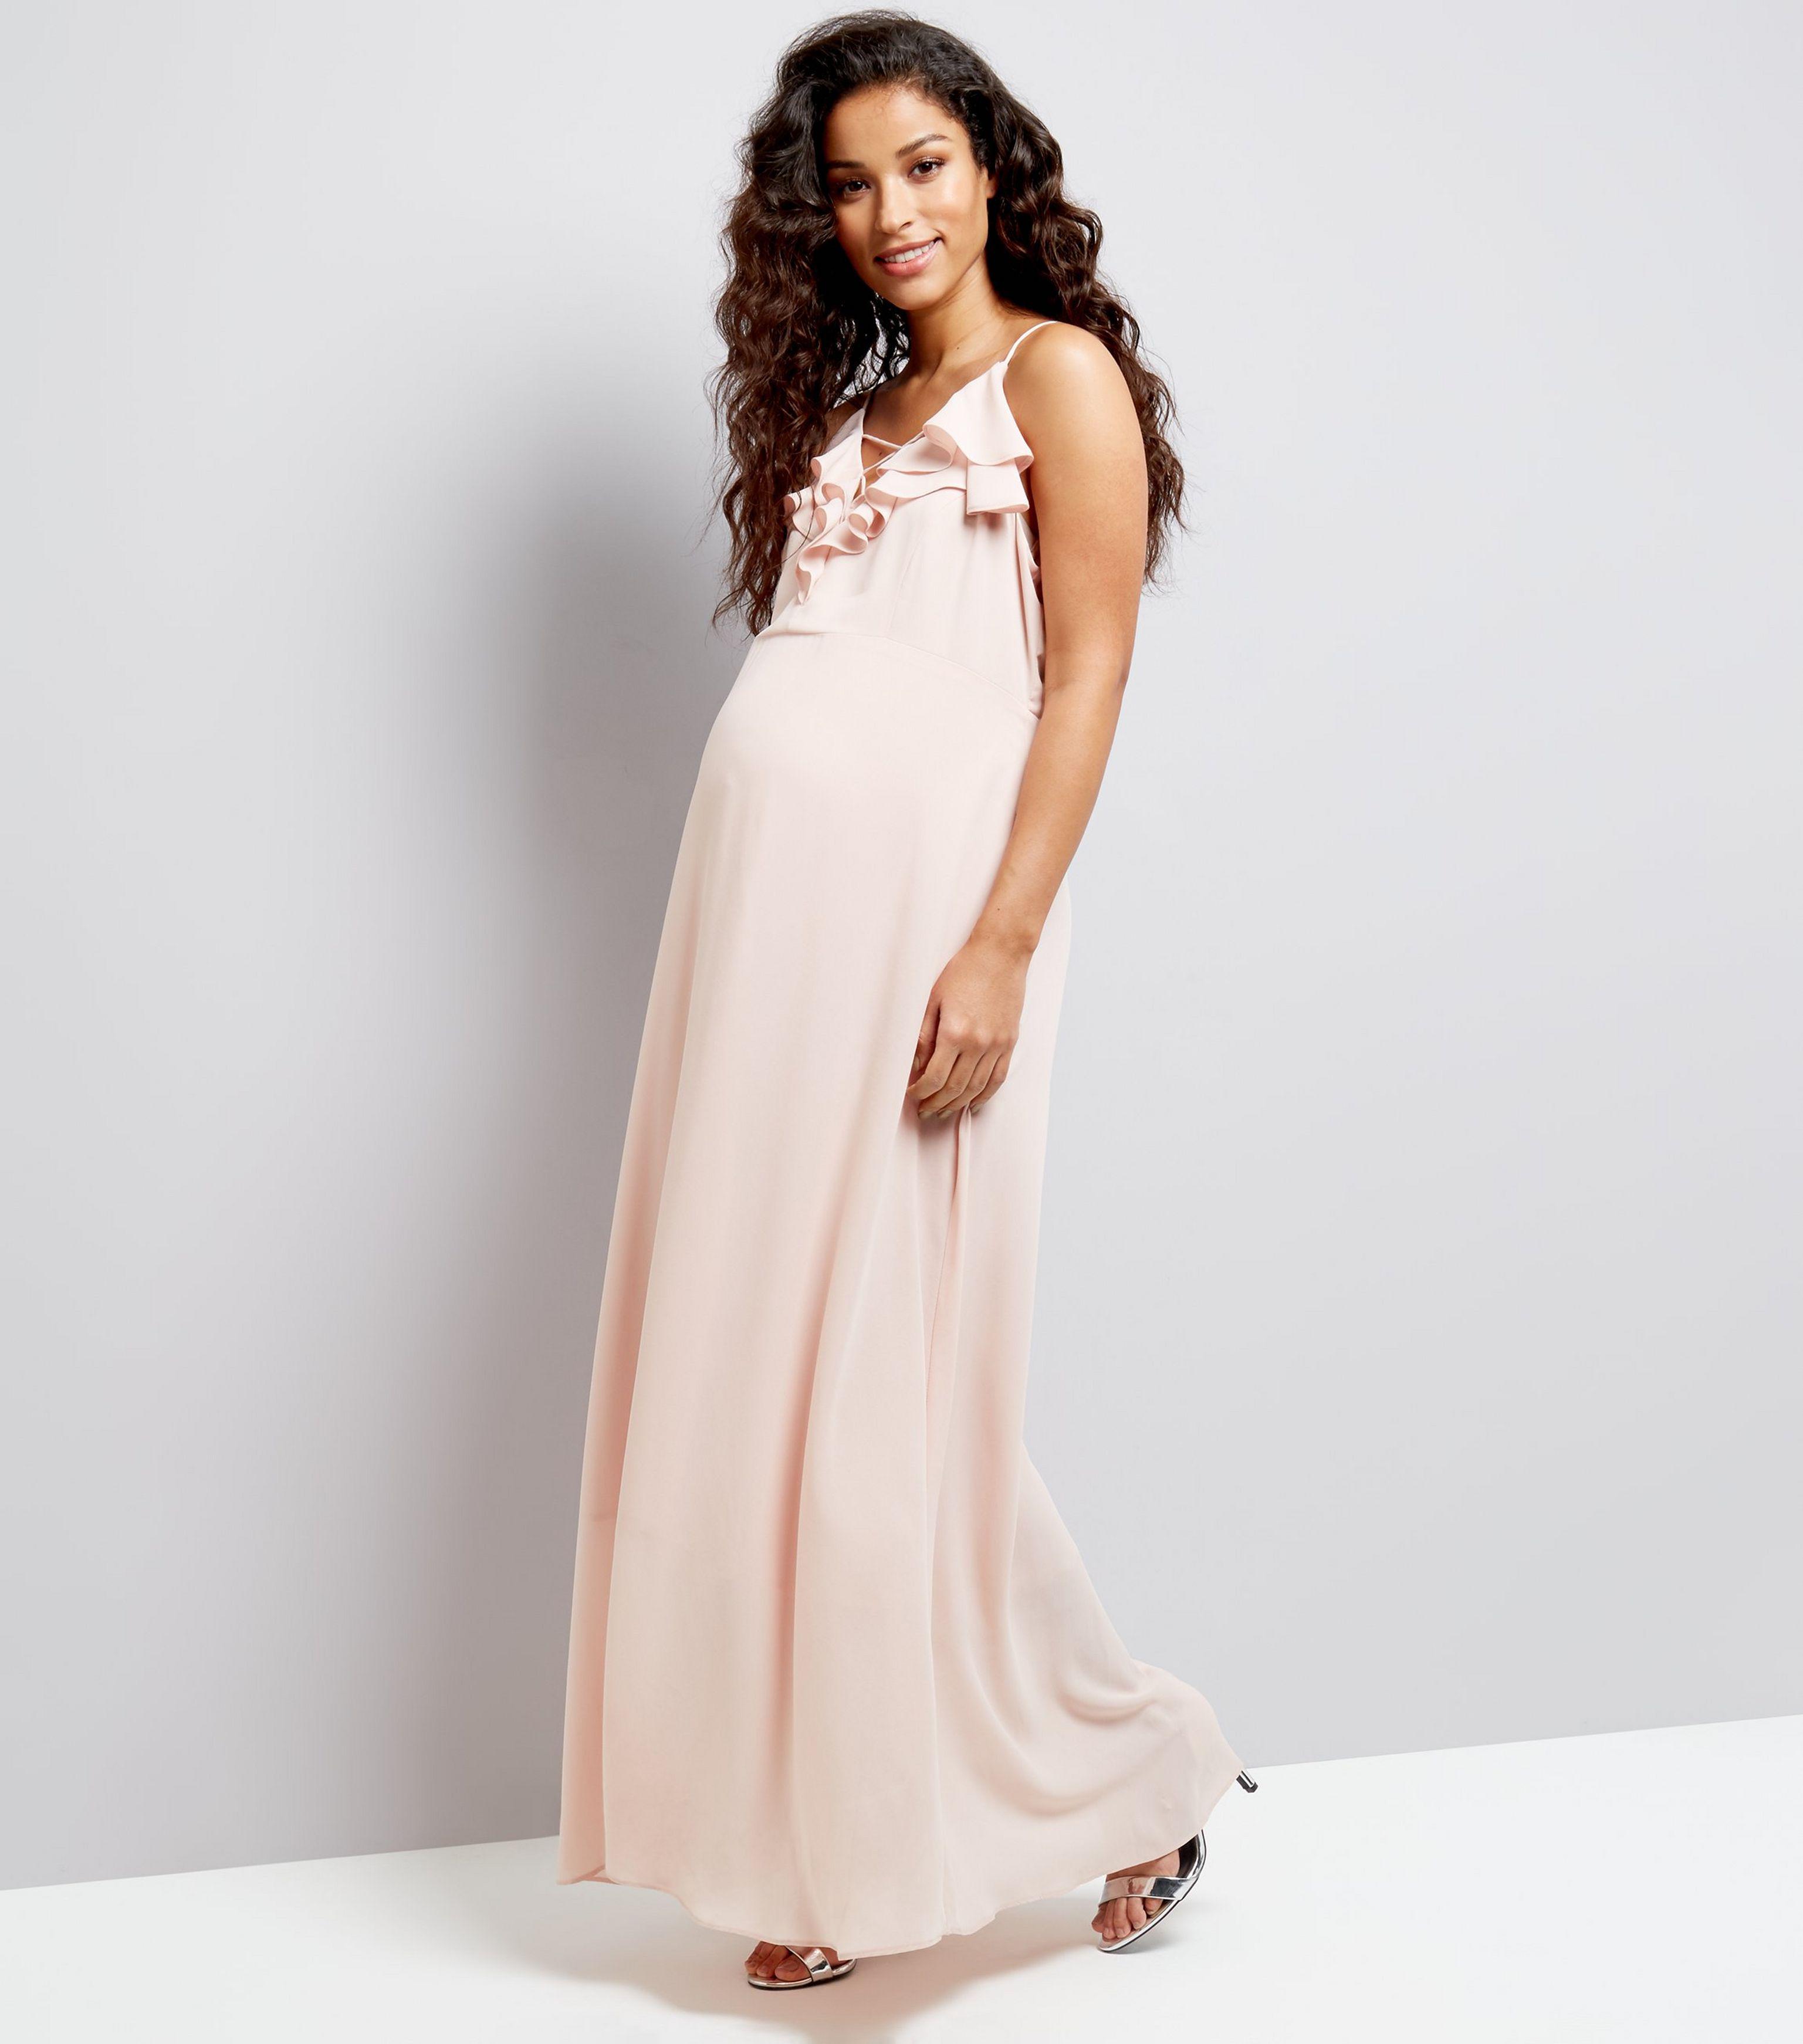 53a4caa154b New Look Maxi Dresses Maternity - Gomes Weine AG